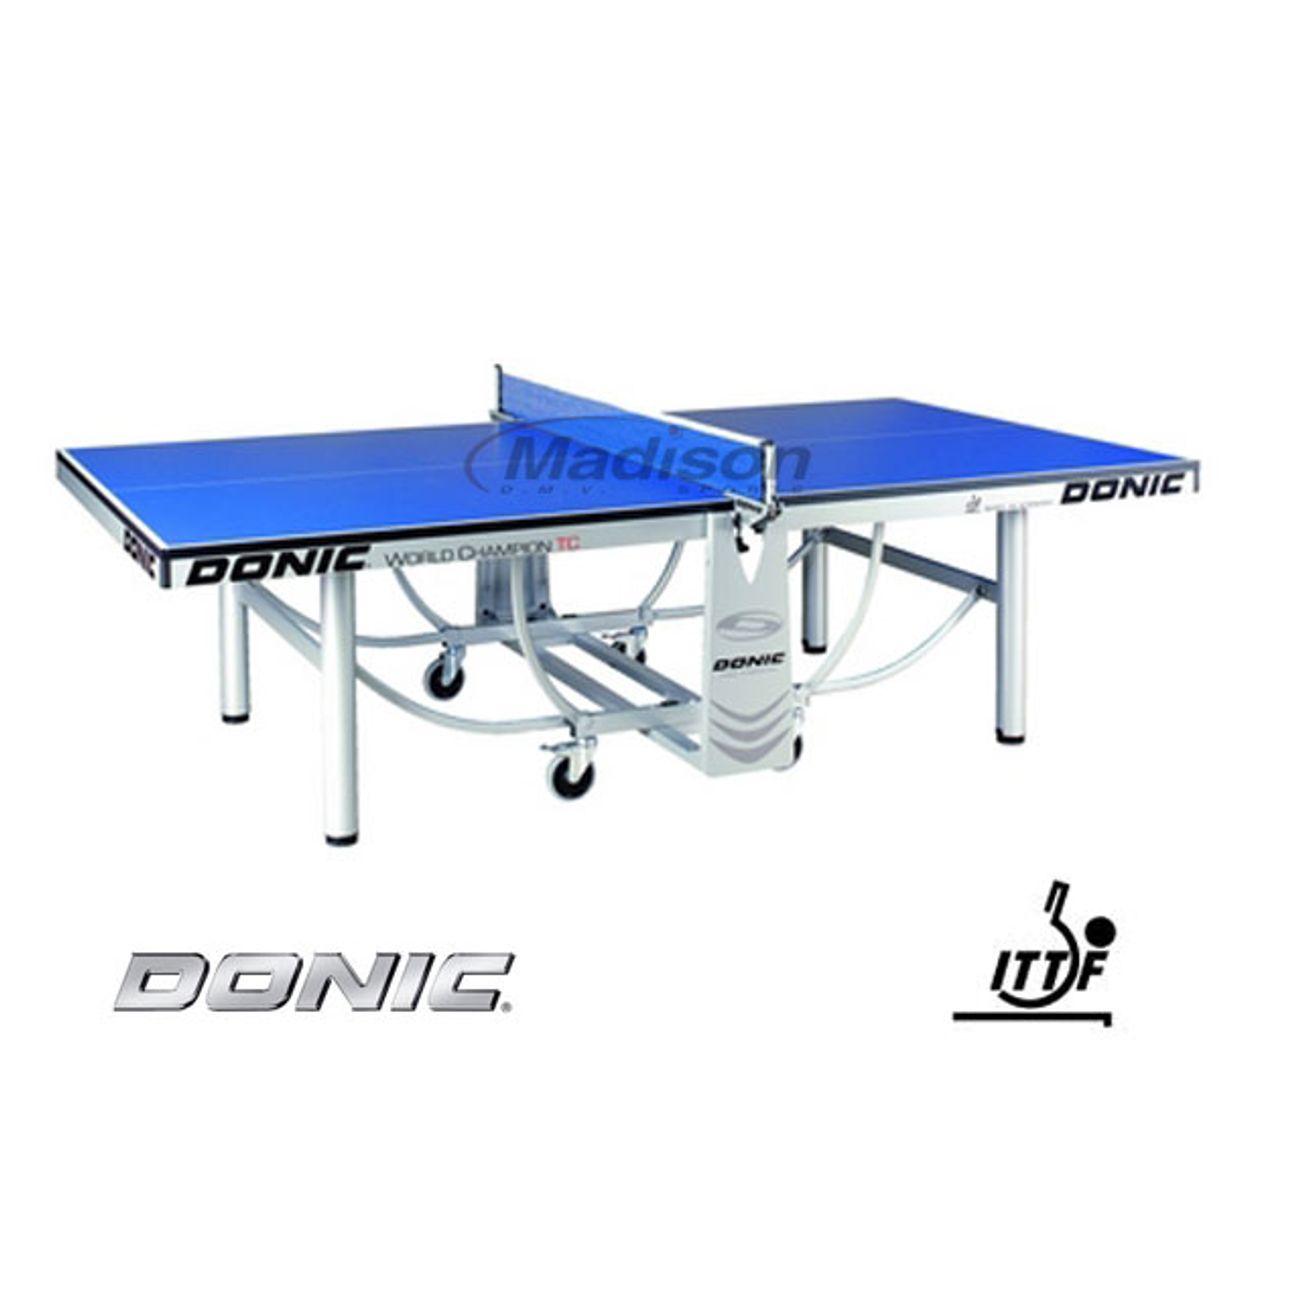 donic table world champion 25mm ittf achat et prix pas cher go sport. Black Bedroom Furniture Sets. Home Design Ideas